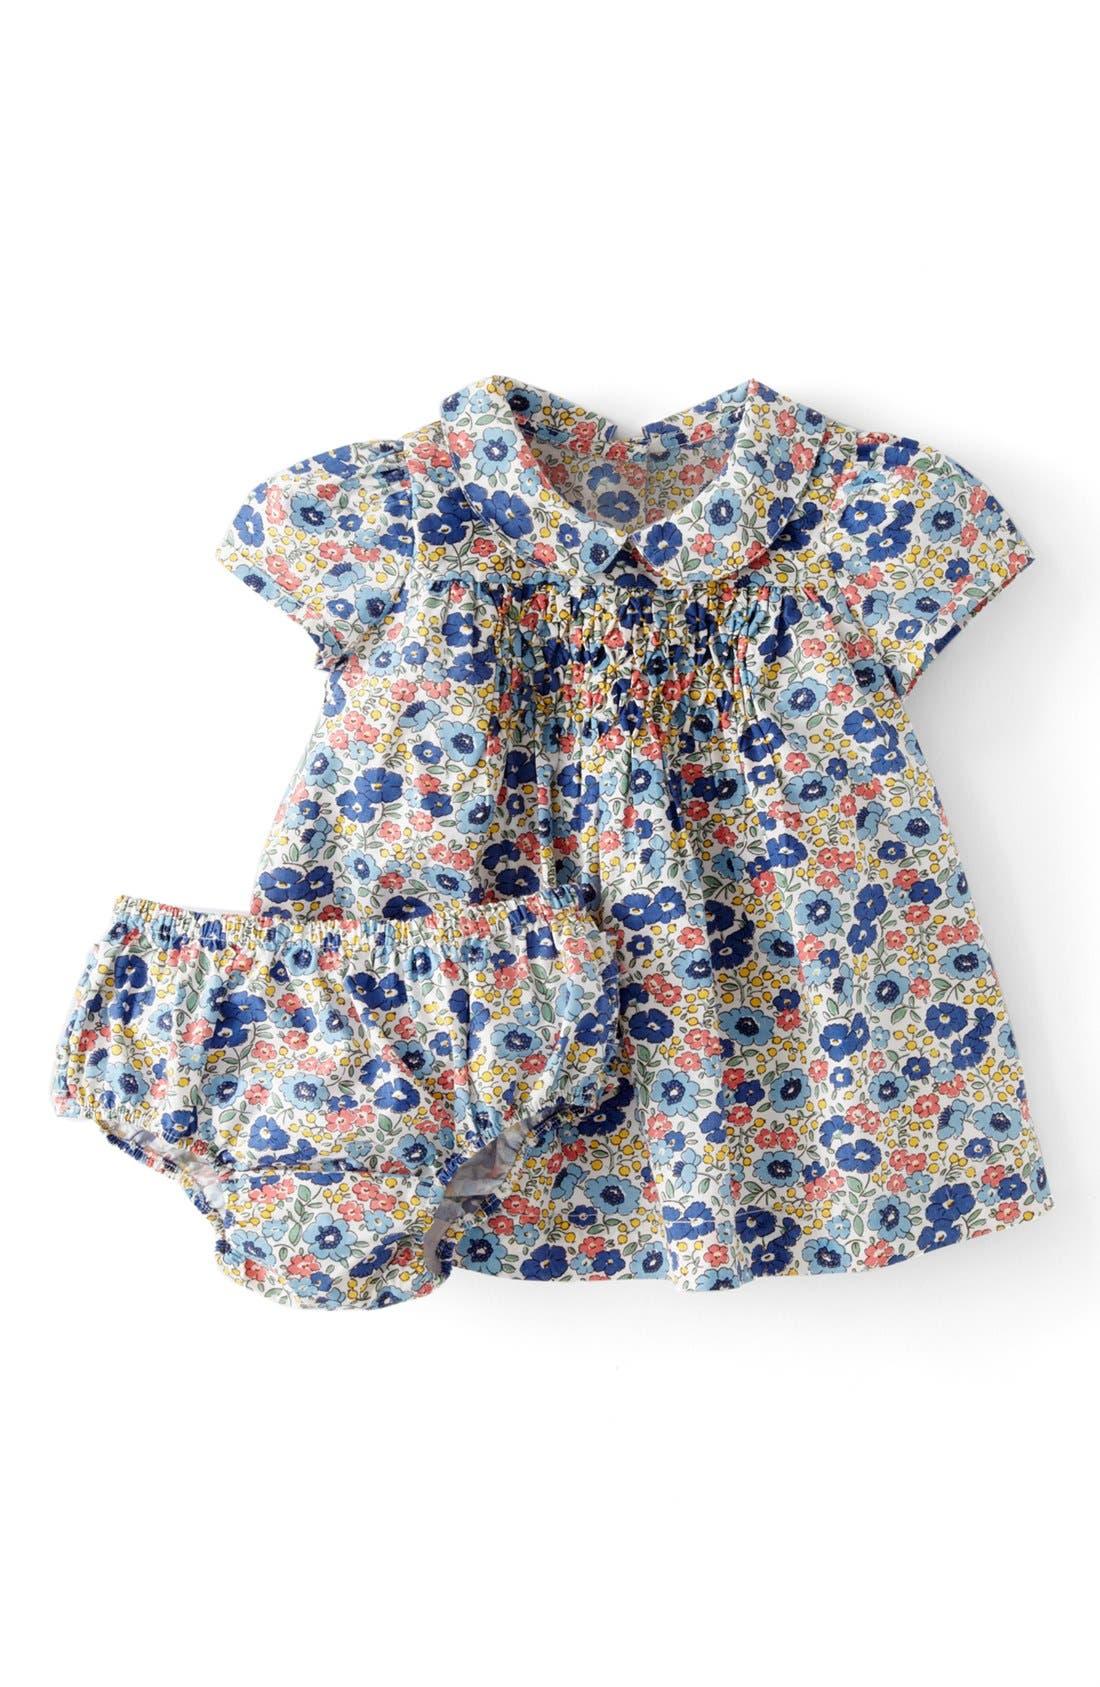 Alternate Image 1 Selected - Mini Boden 'Pretty Printed' Tea Dress (Baby Girls)